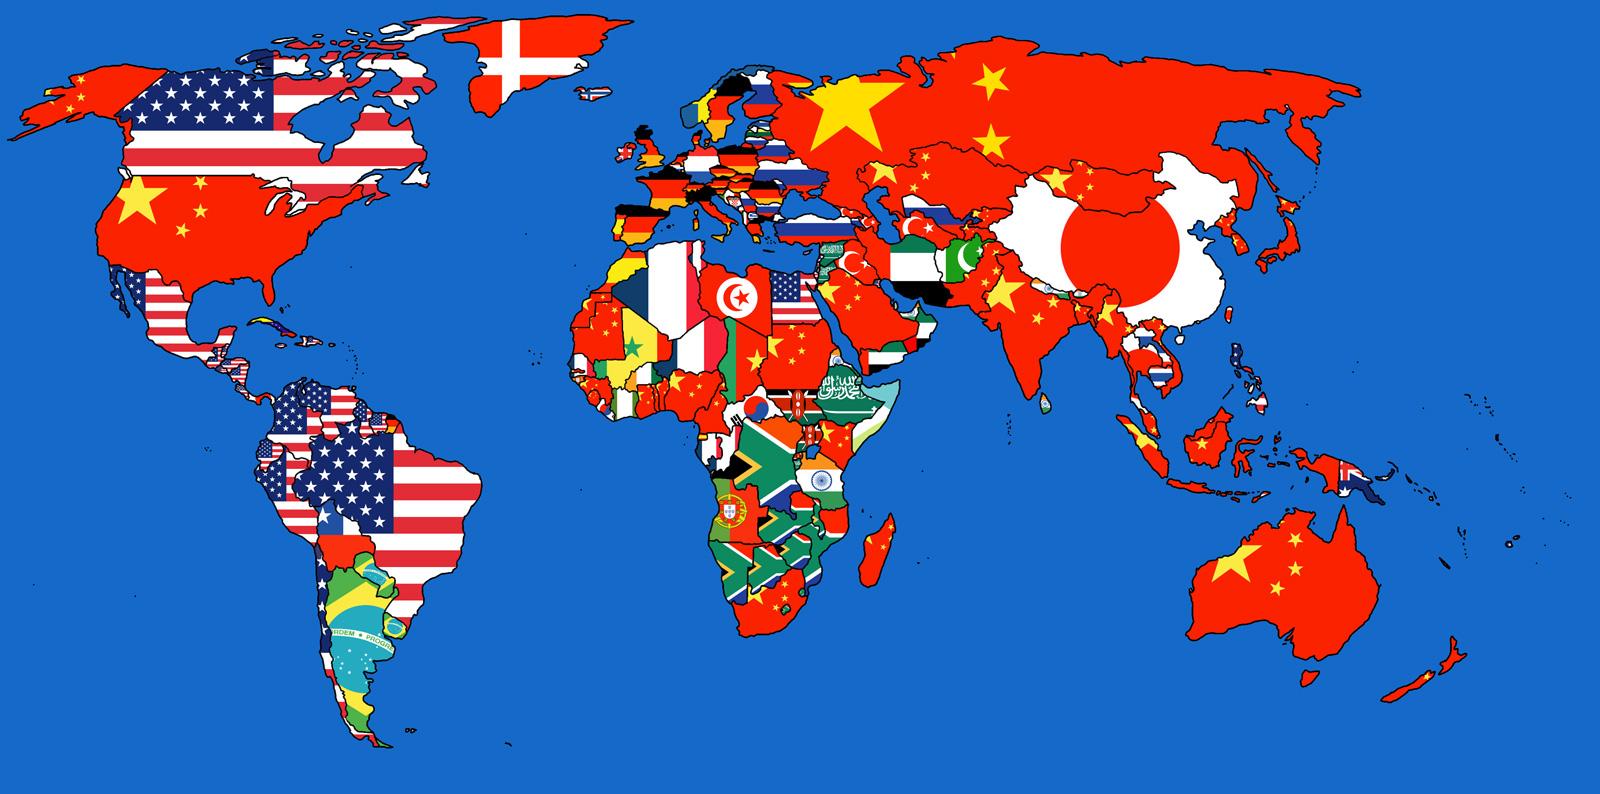 Mapa Del Mundo China.De Donde Llegan Mas Mercancias Un Mapa Revela Los Mayores Exportadores Por Pais Rt